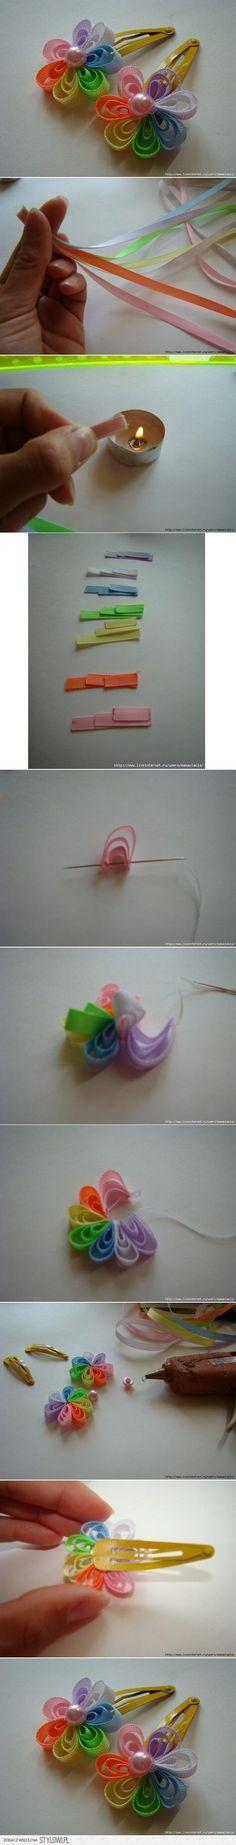 DIY Ribbon Flower Hair Clip DIY could use this on a wreath too Diy Ribbon Flowers, Ribbon Art, Ribbon Crafts, Flower Crafts, Ribbon Bows, Fabric Flowers, Diy Crafts, Flower Diy, Paper Flowers